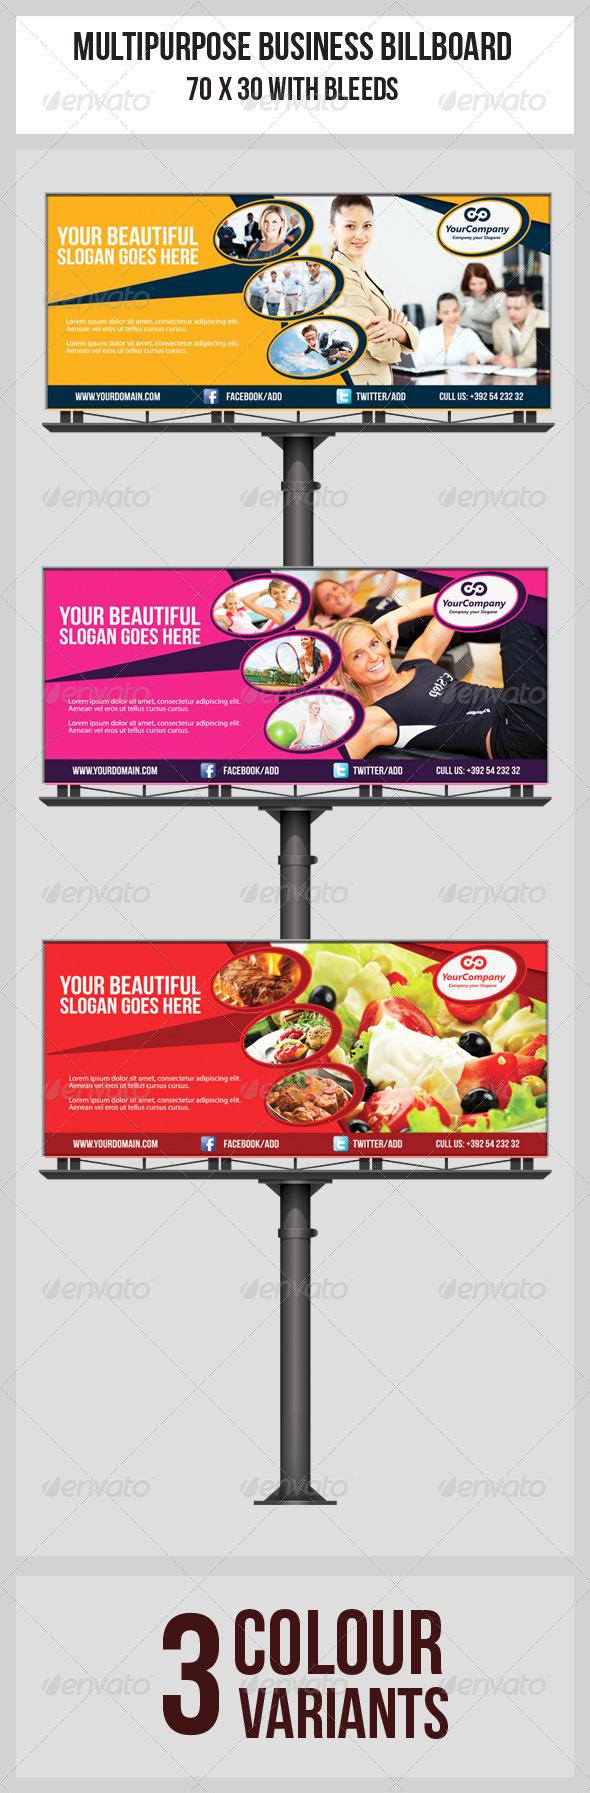 Multipurpose Business Billboard Template  - Signage Print Templates